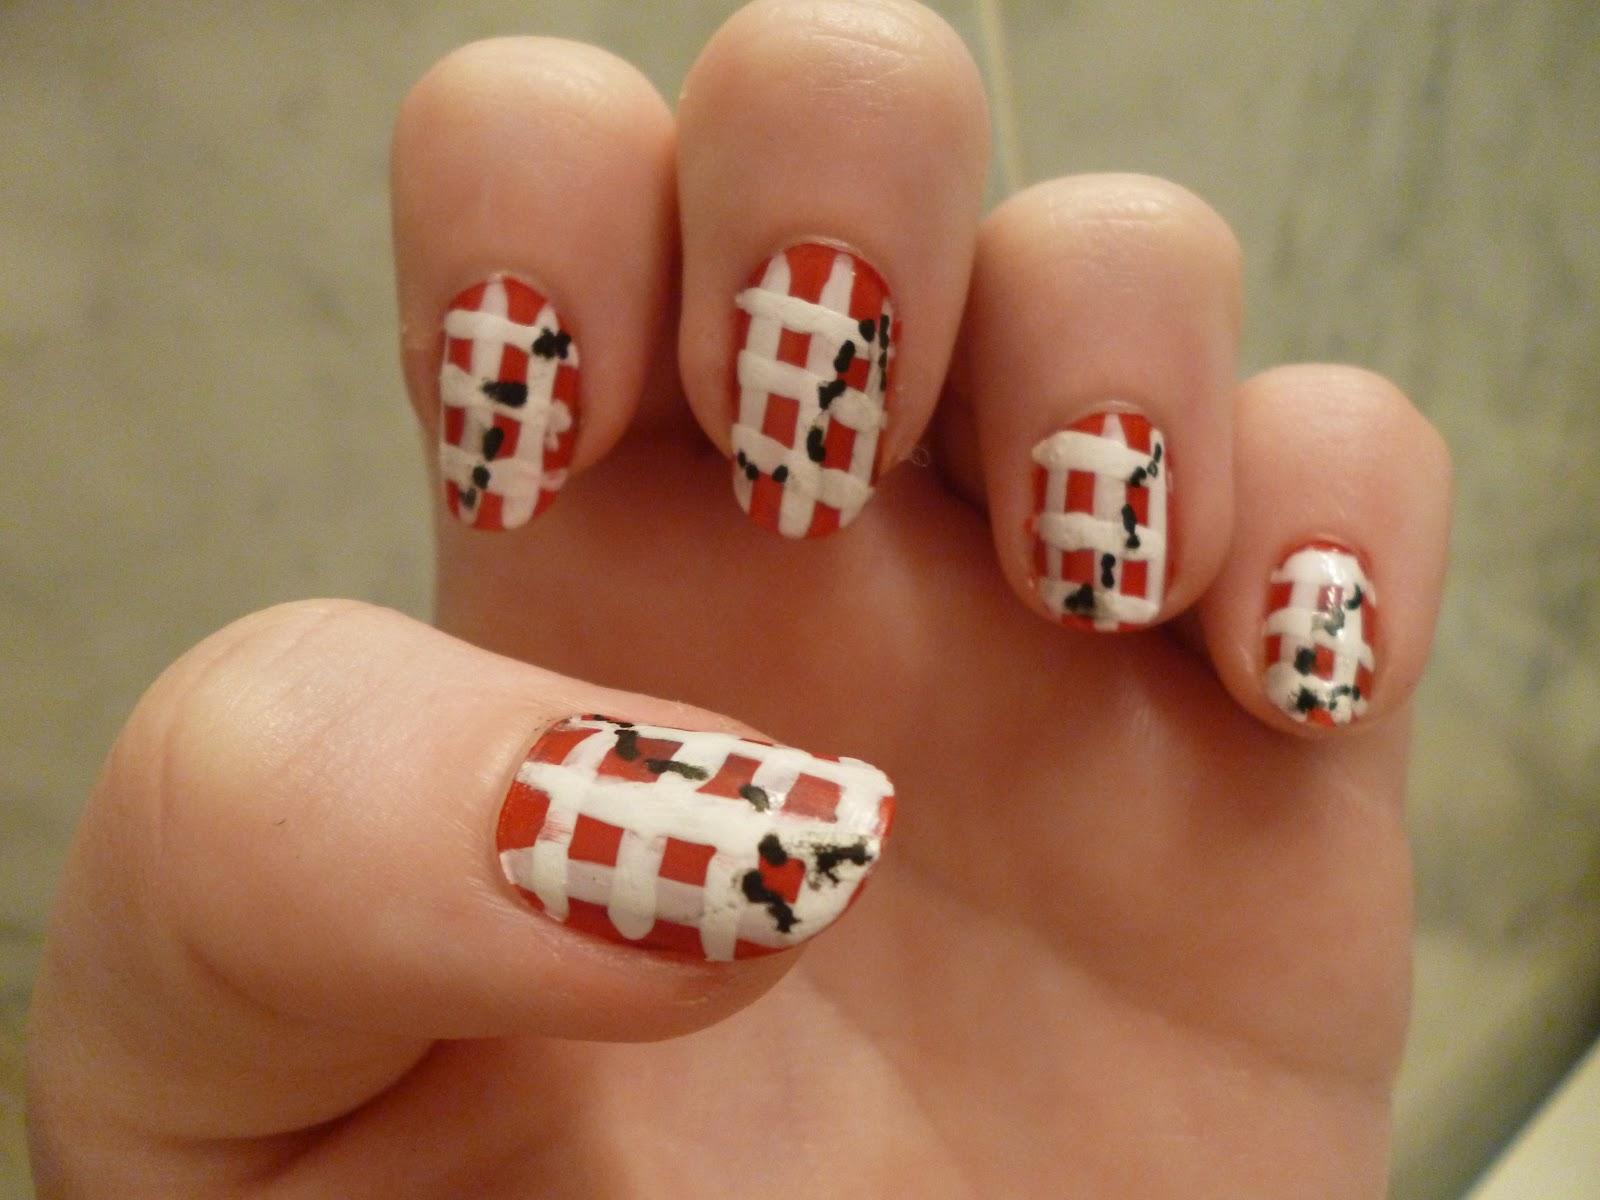 nail arts at home nail art designs. Black Bedroom Furniture Sets. Home Design Ideas